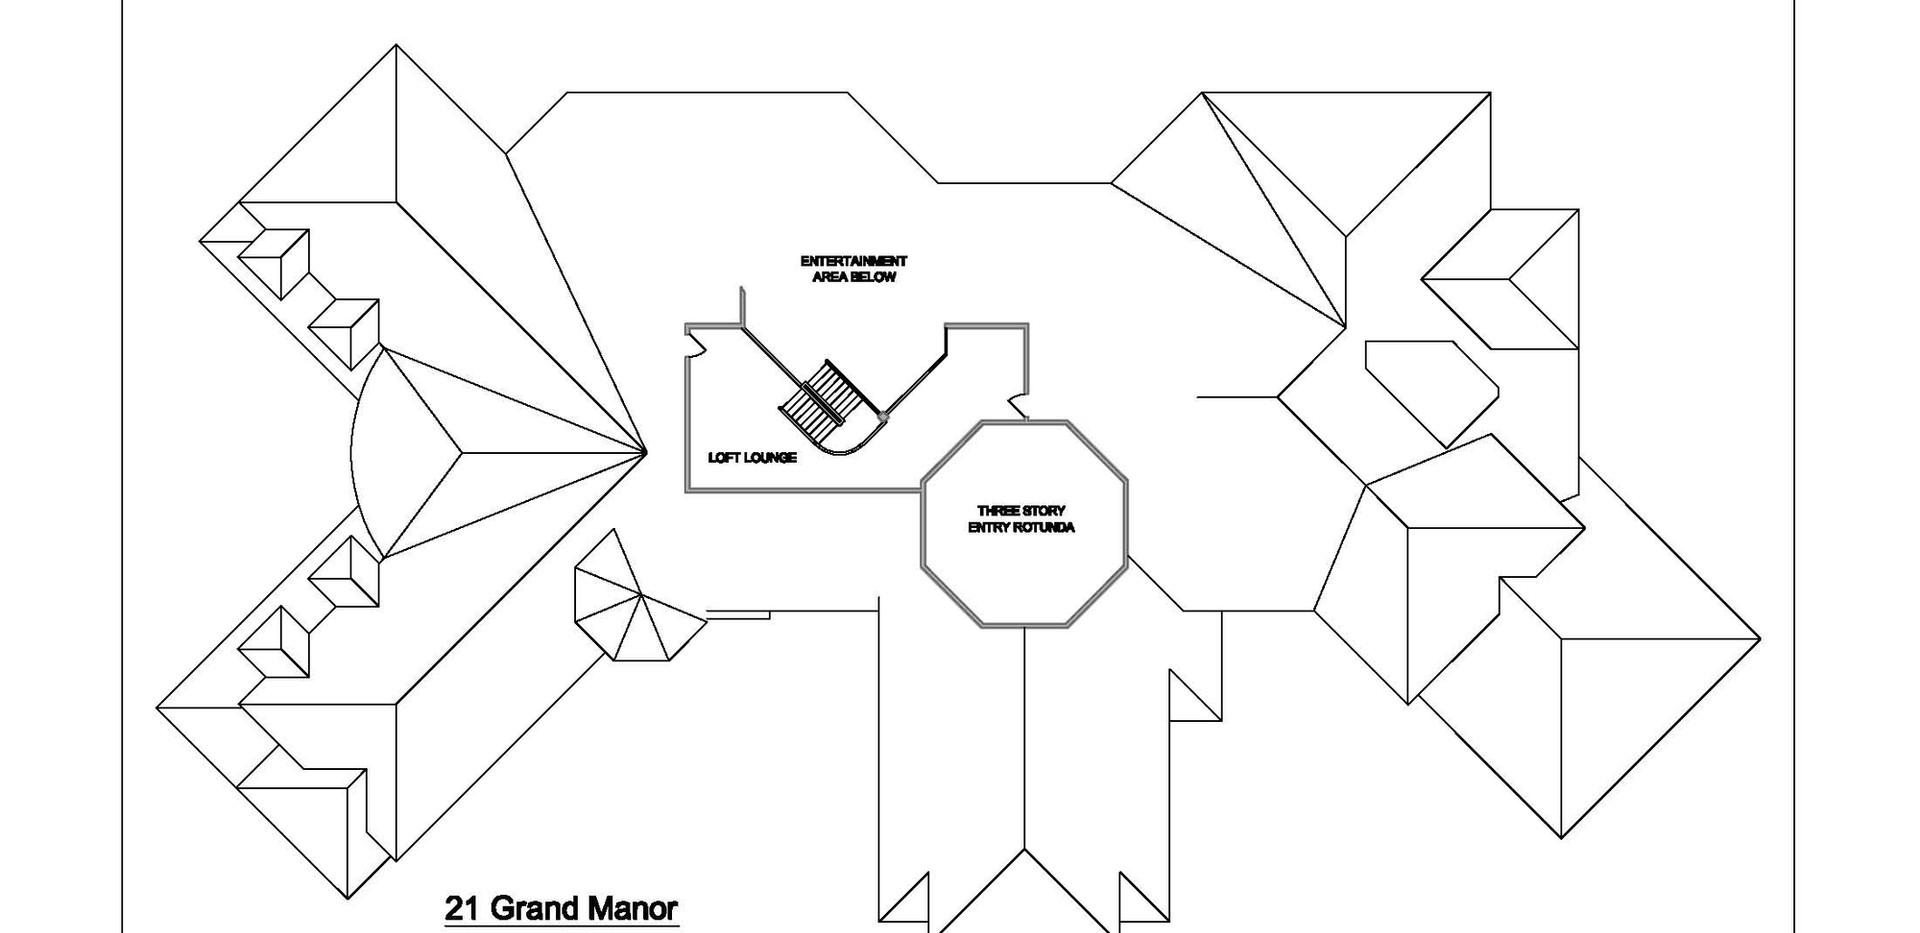 21 Grand Manor Third Floor Plan.jpg